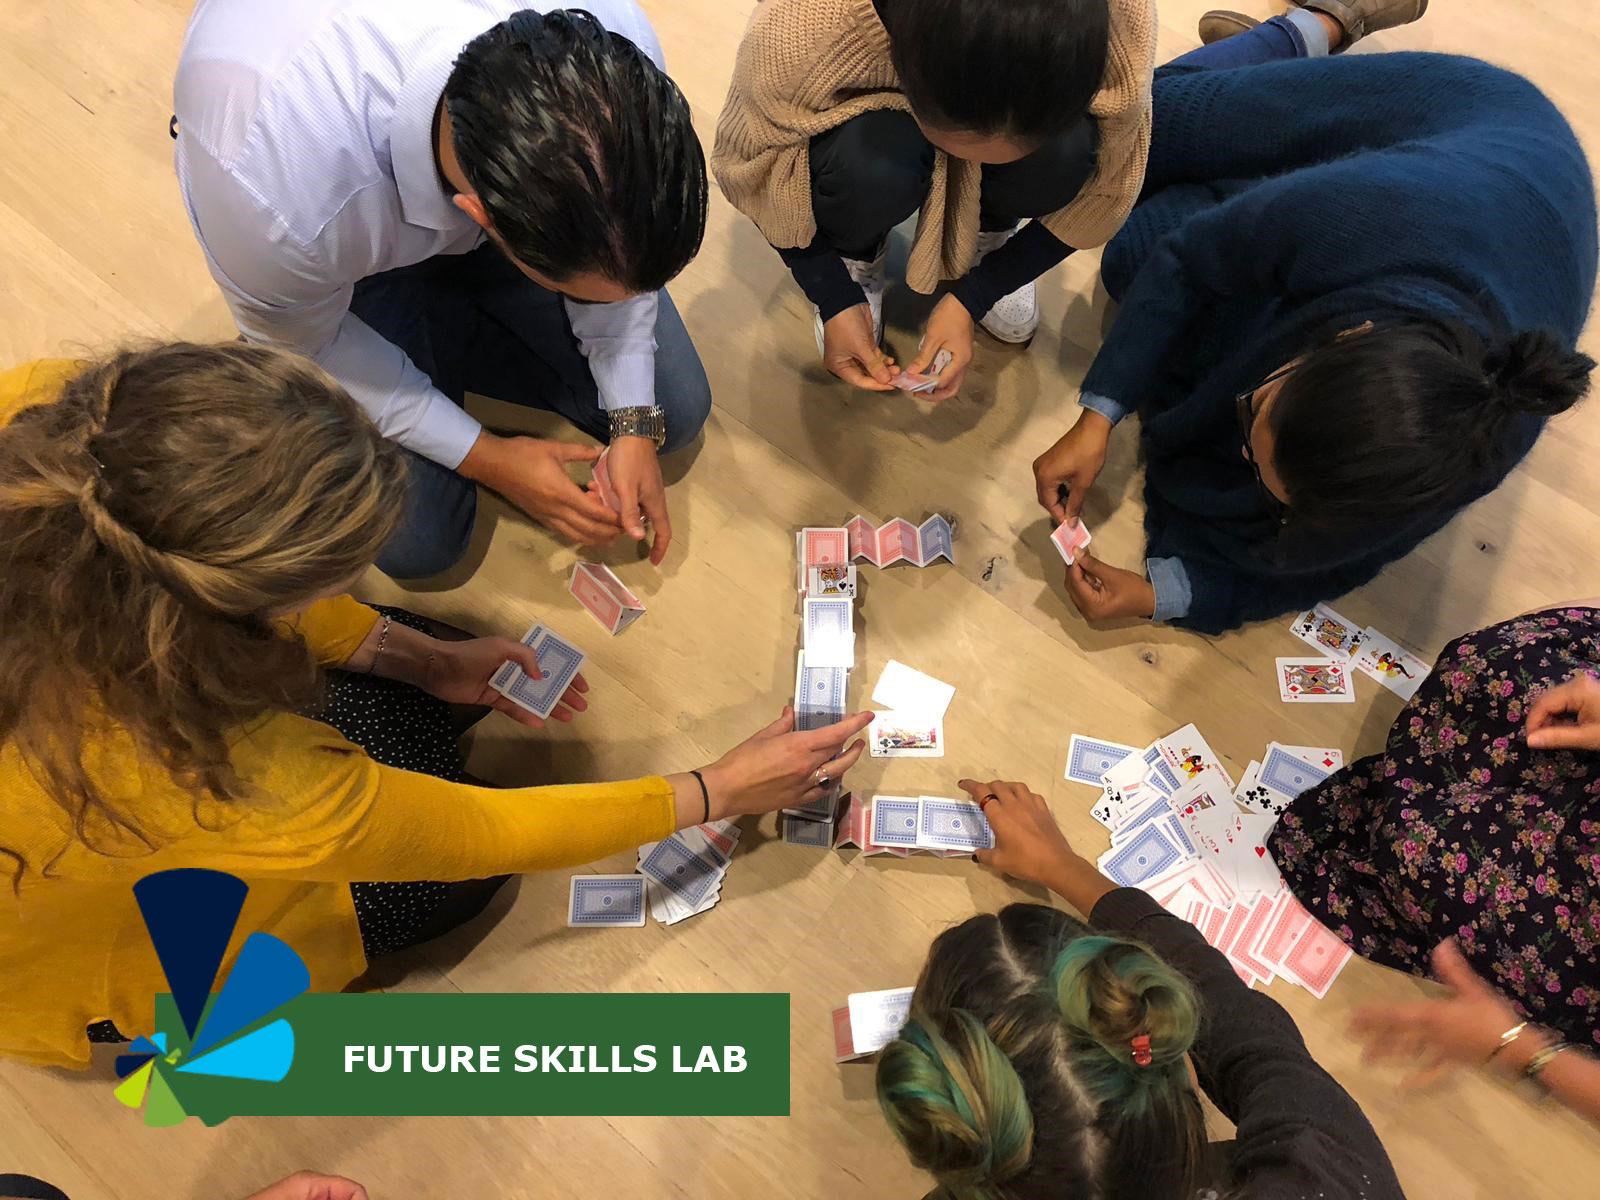 Future Skills Lab